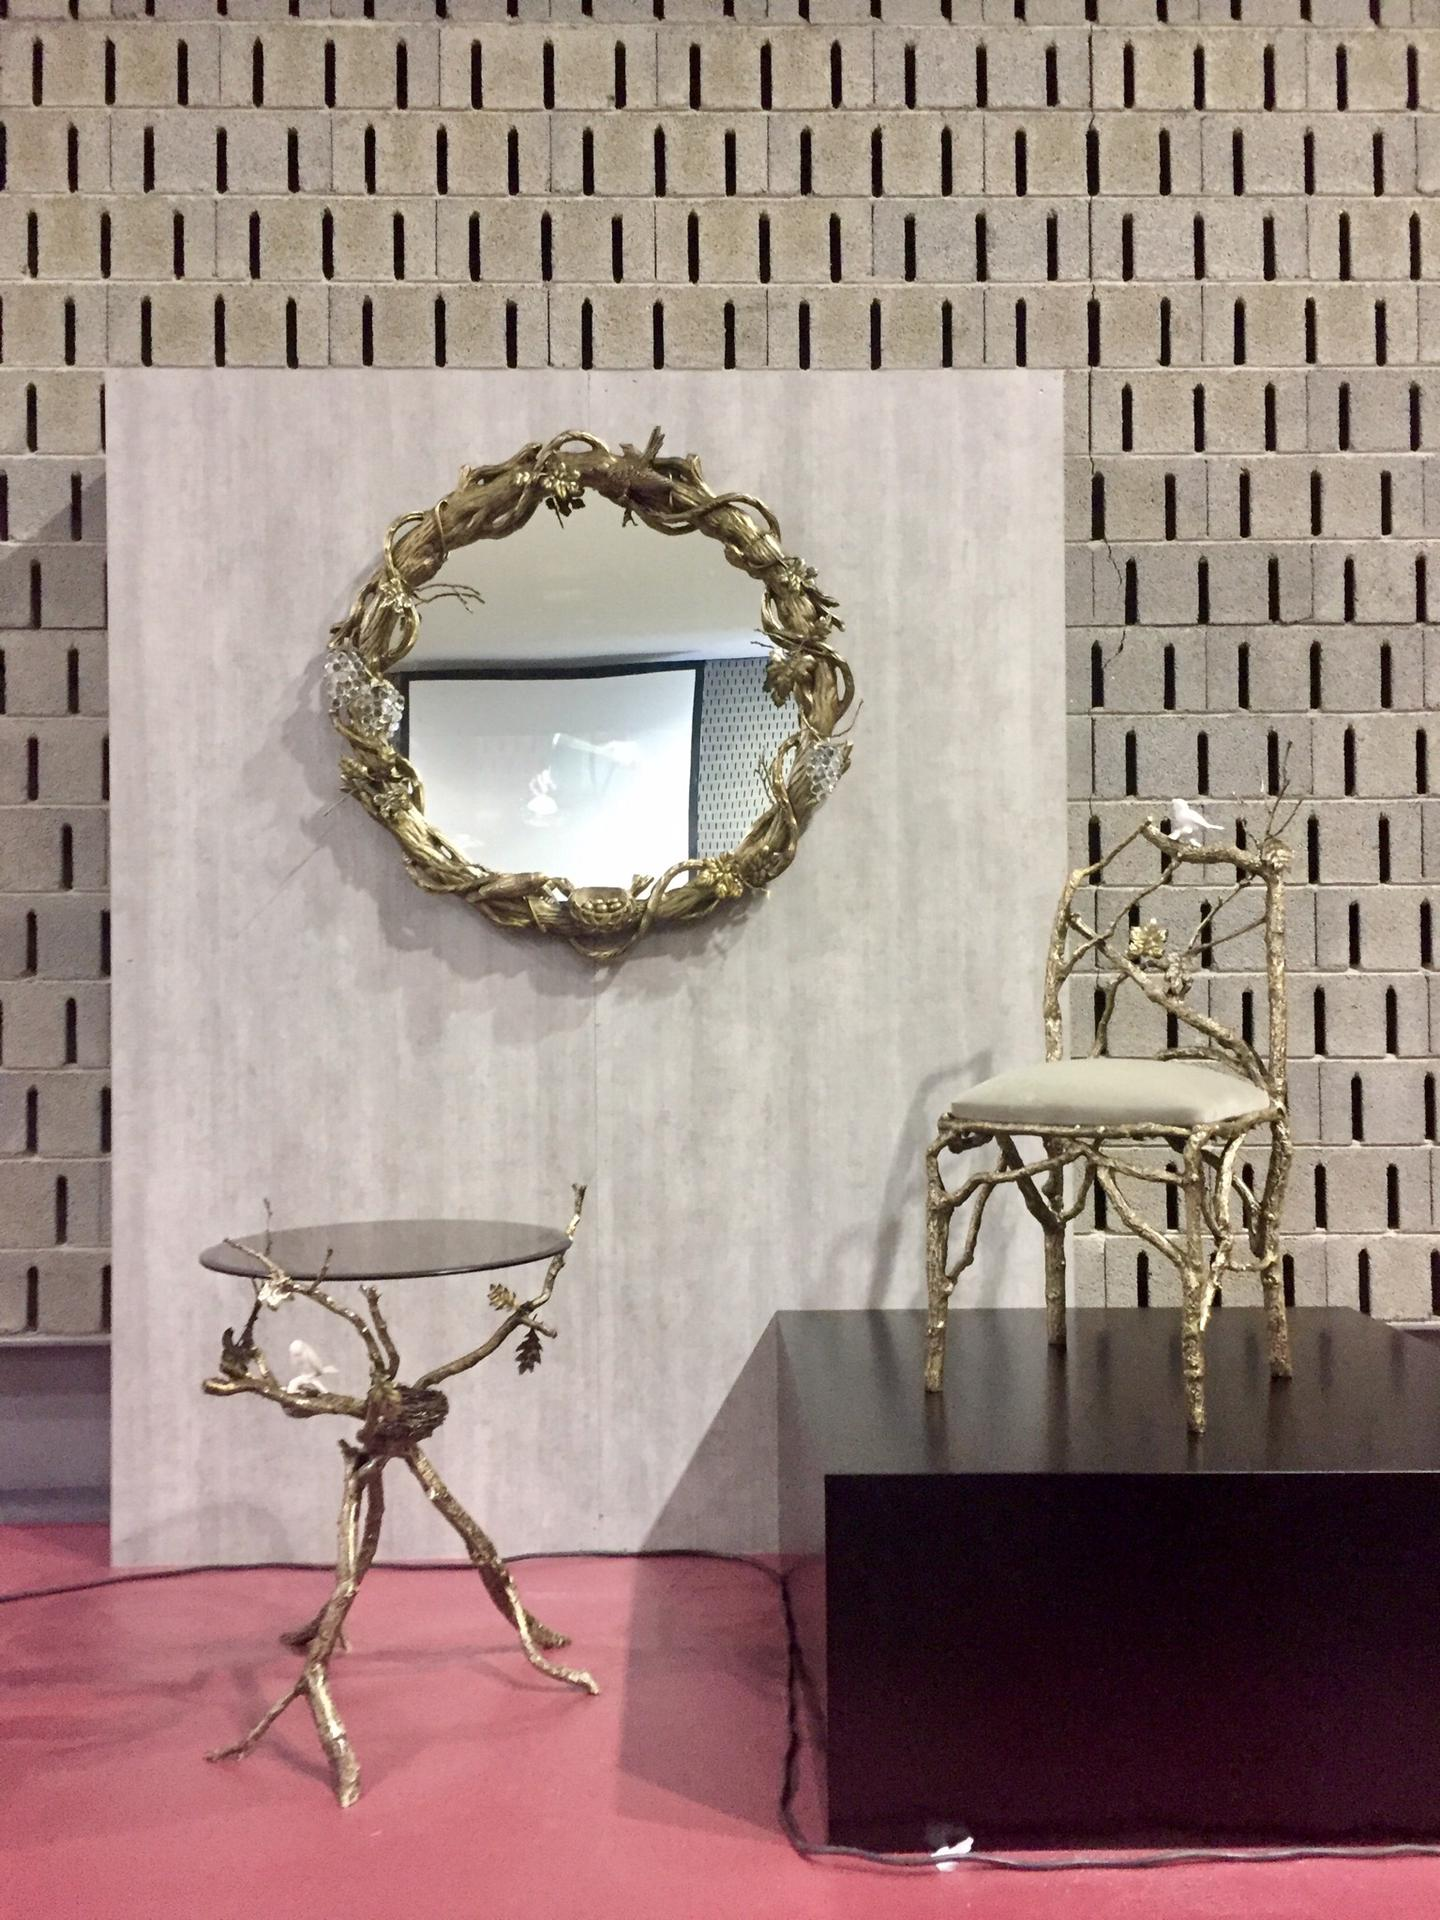 luxury design and craftsmanship summit Luxury Design & Craftsmanship Summit: Highlights WhatsApp Image 2019 06 26 at 00